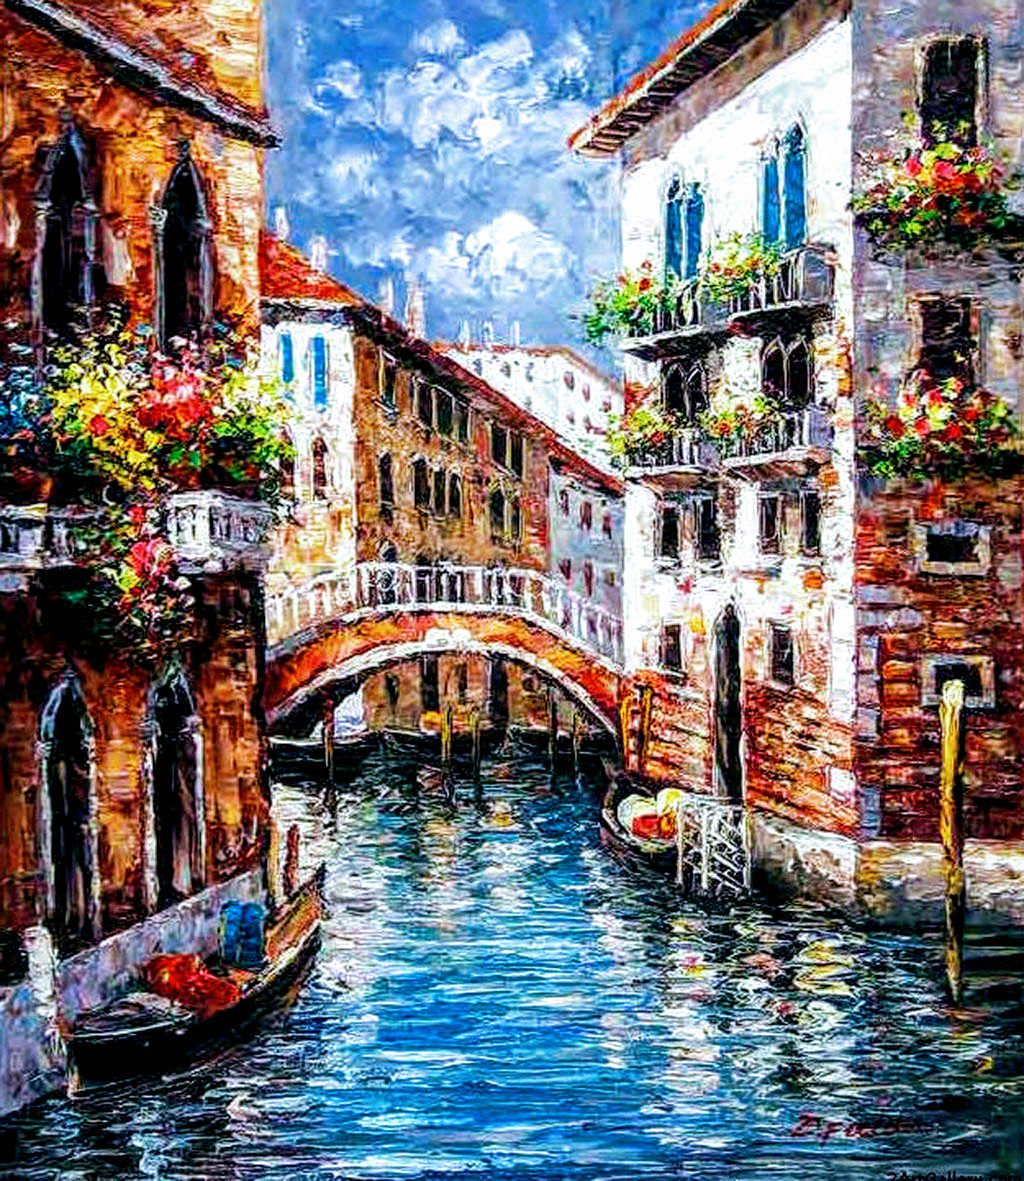 RT @ele9061: #Venice  travel the world ❤️ https://t.co/bSQ6T24Vny